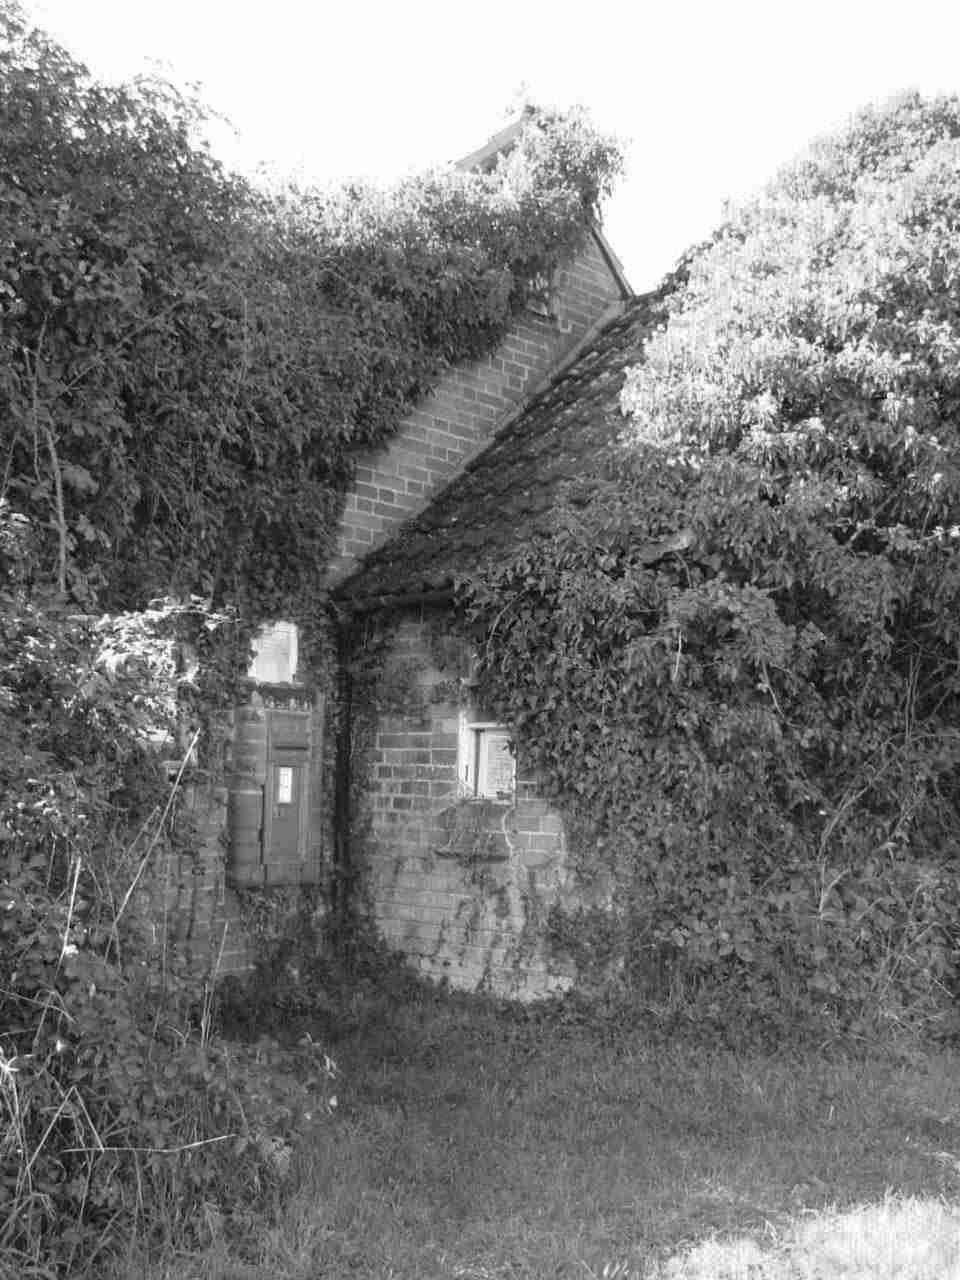 The Wigboroughs' Village Hall